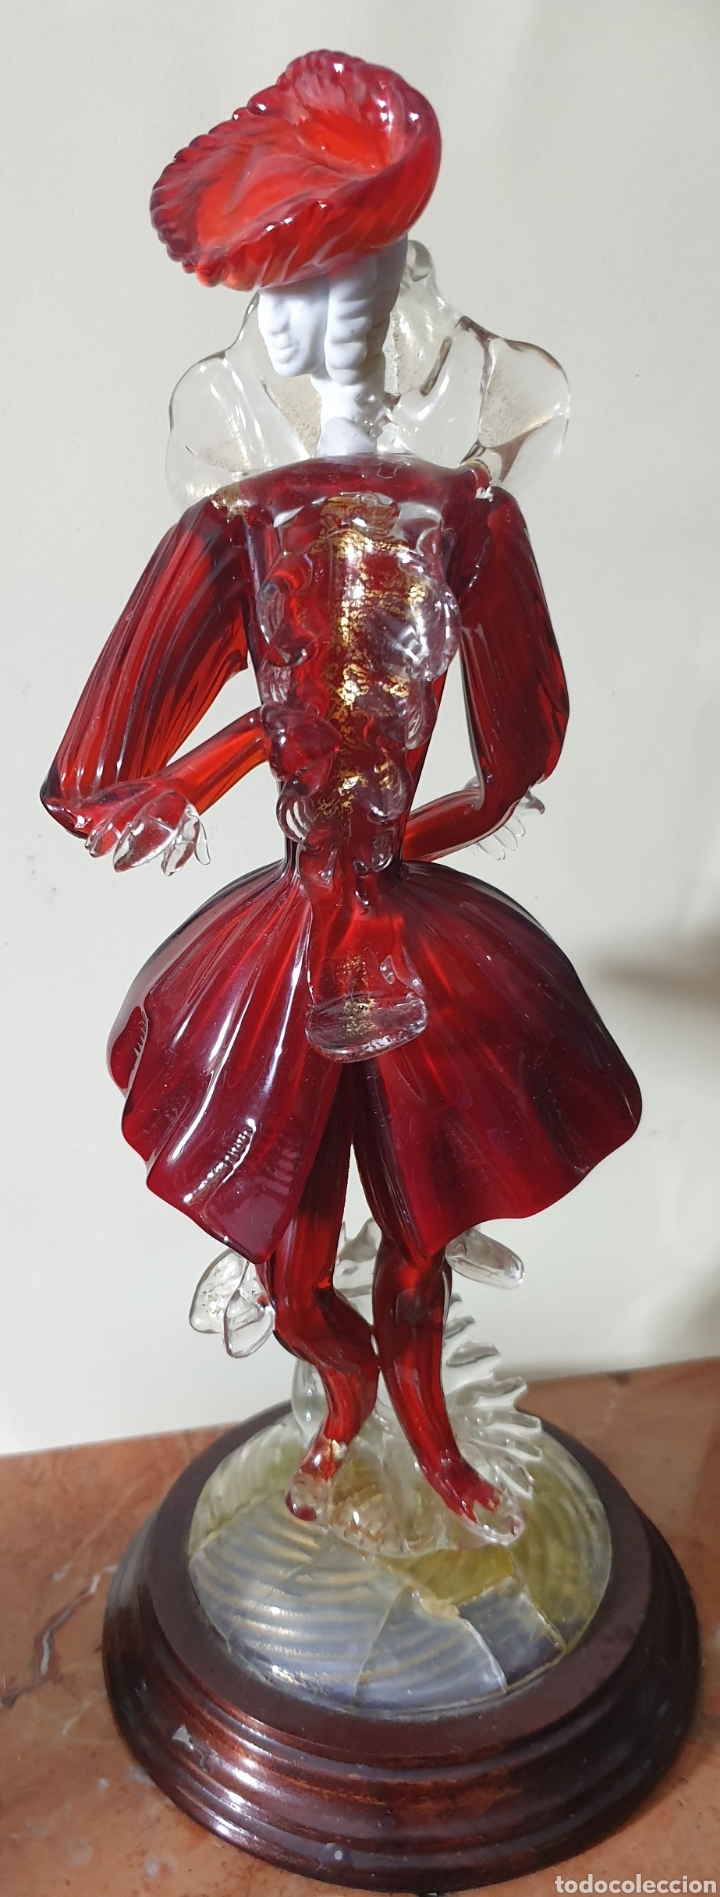 Antigüedades: Bonita pareja de cristal de murano de mediados o principios sigloXIX - Foto 3 - 261983620